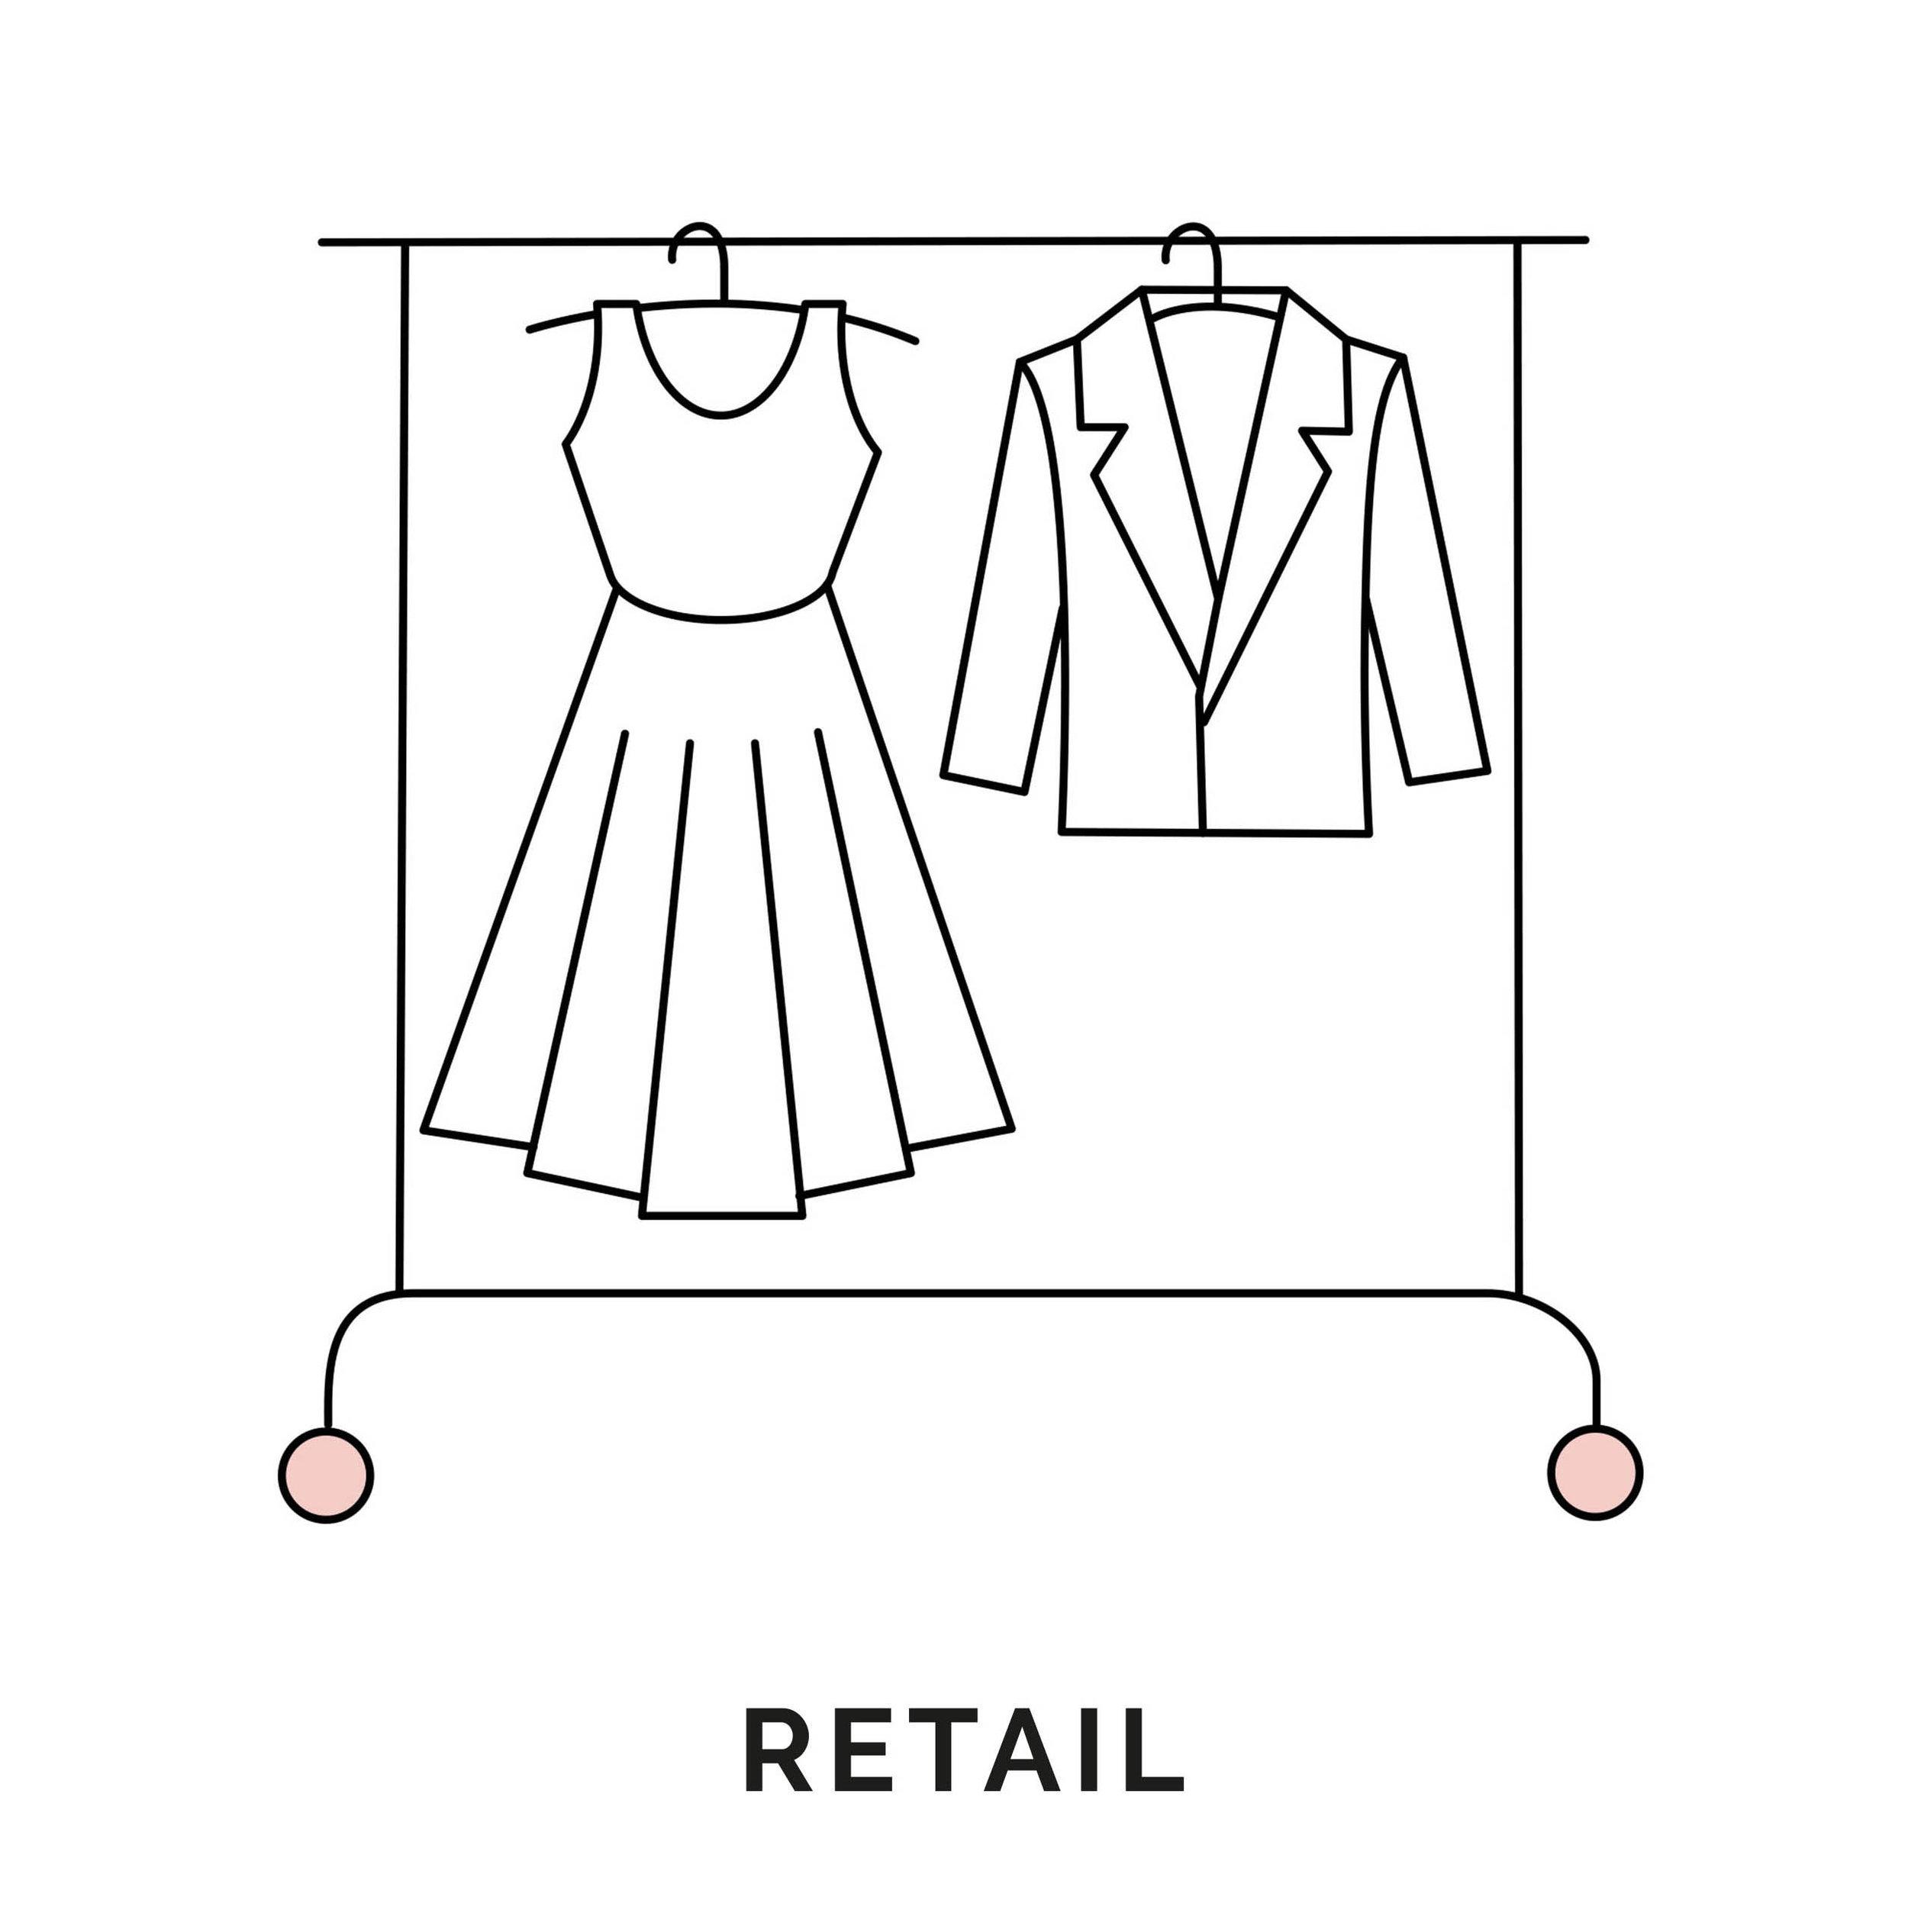 POKE_studio_services_retail.jpg